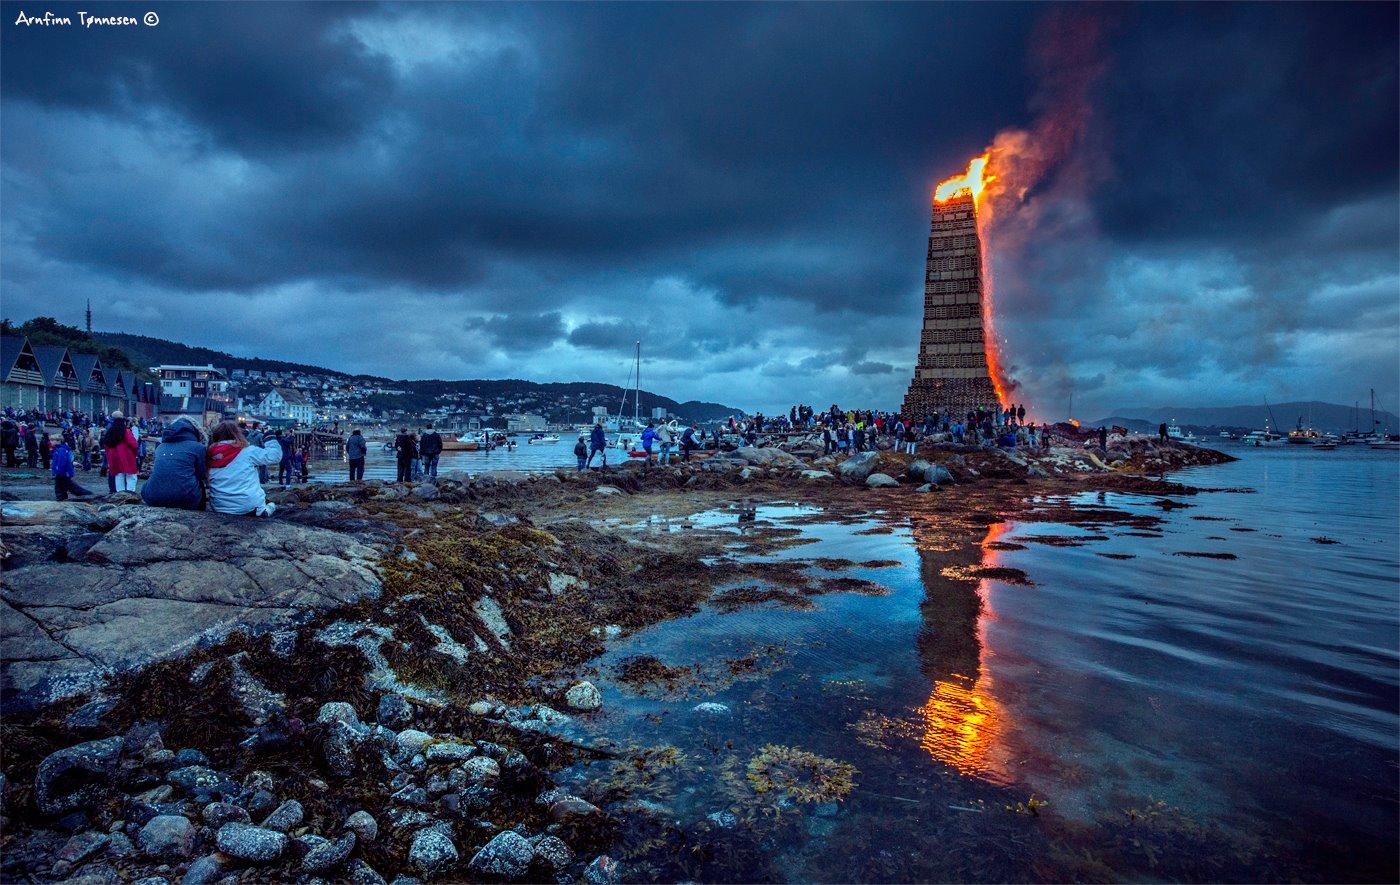 À la Saint-Jean, la ville norvégienne Ålesund s'embrase